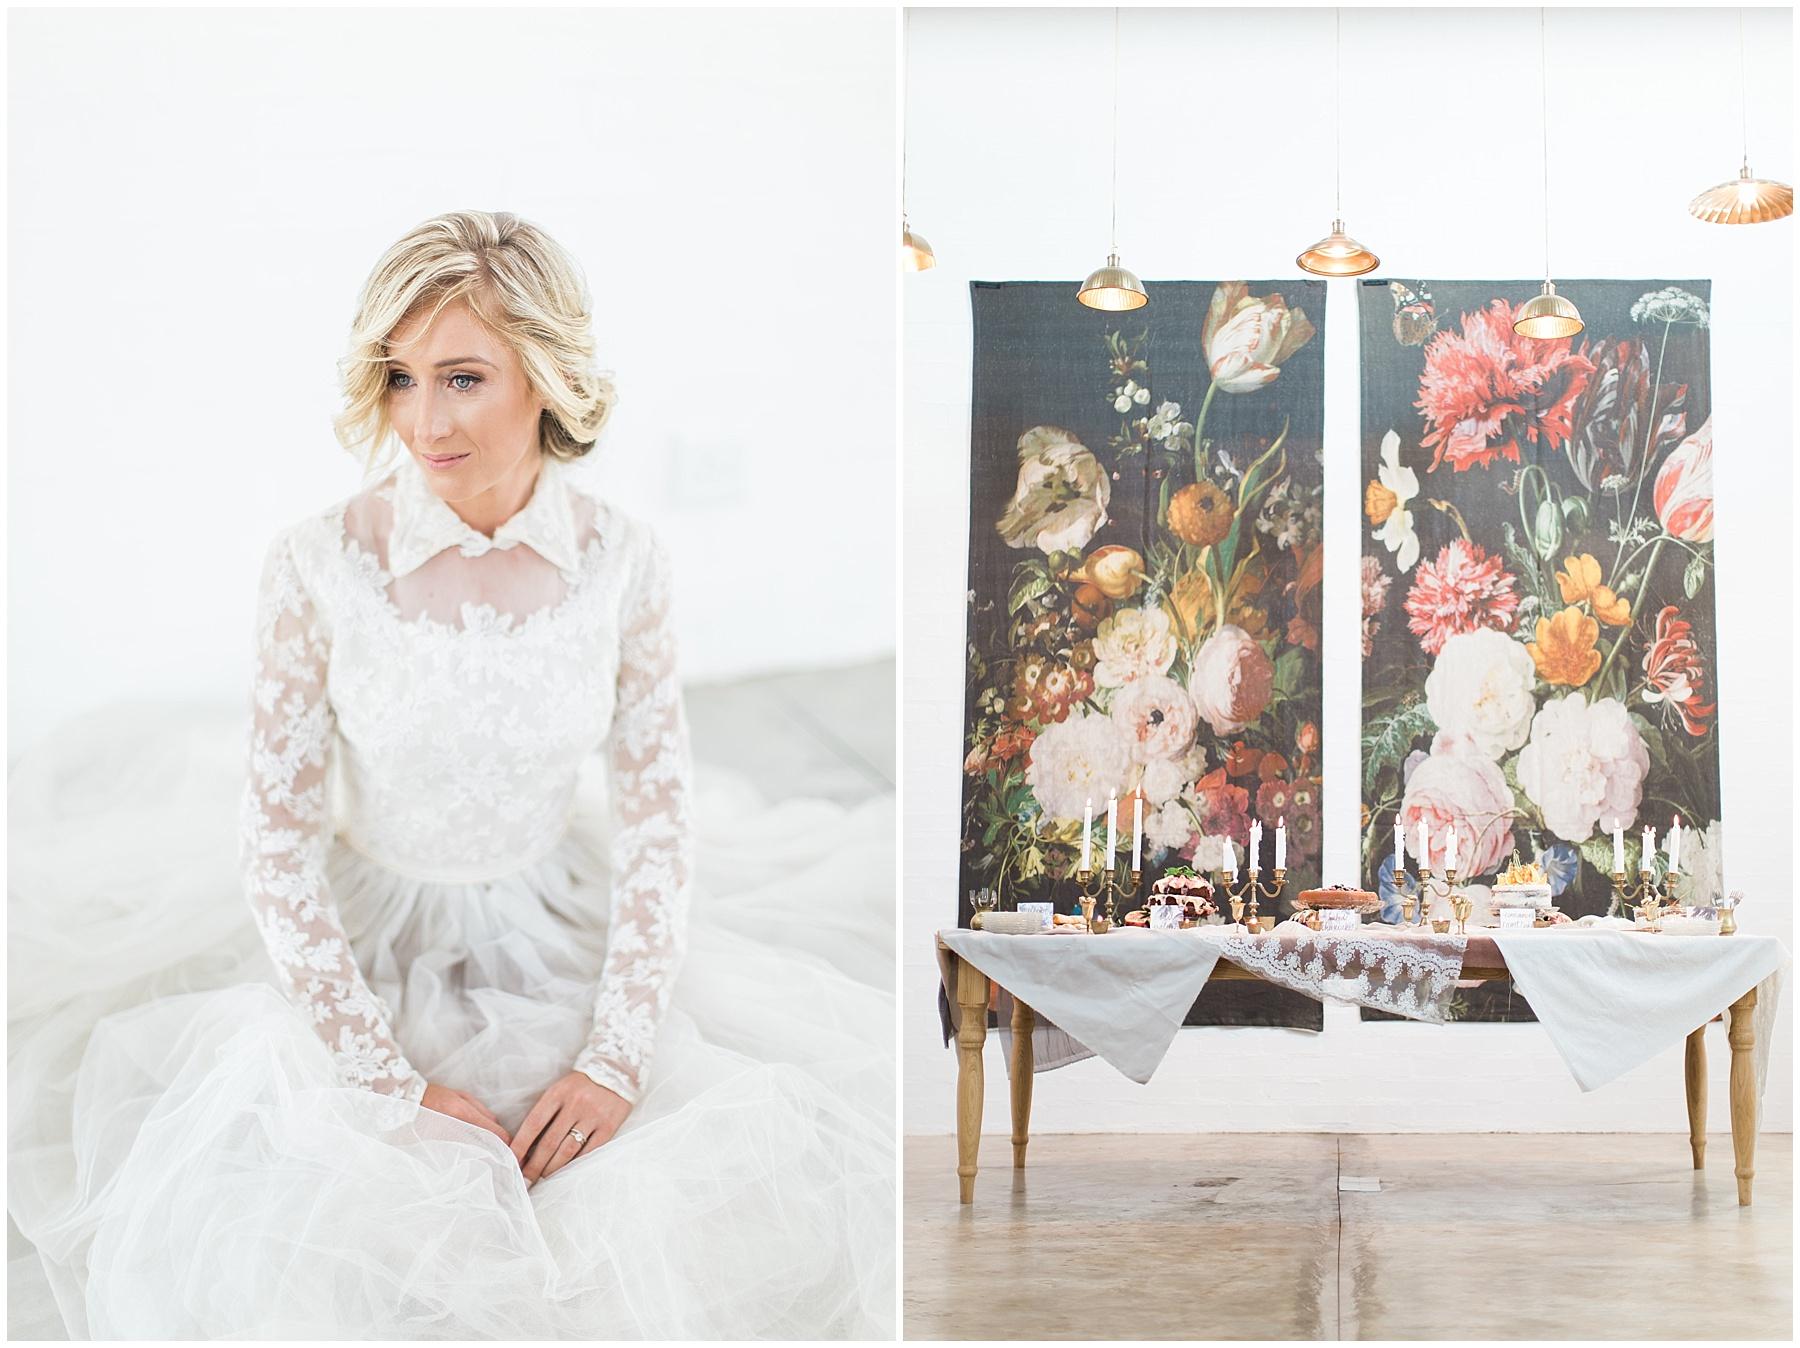 AliciaLandman_JoleneandZander_Wedding_The Pretty Blog_0415.jpg